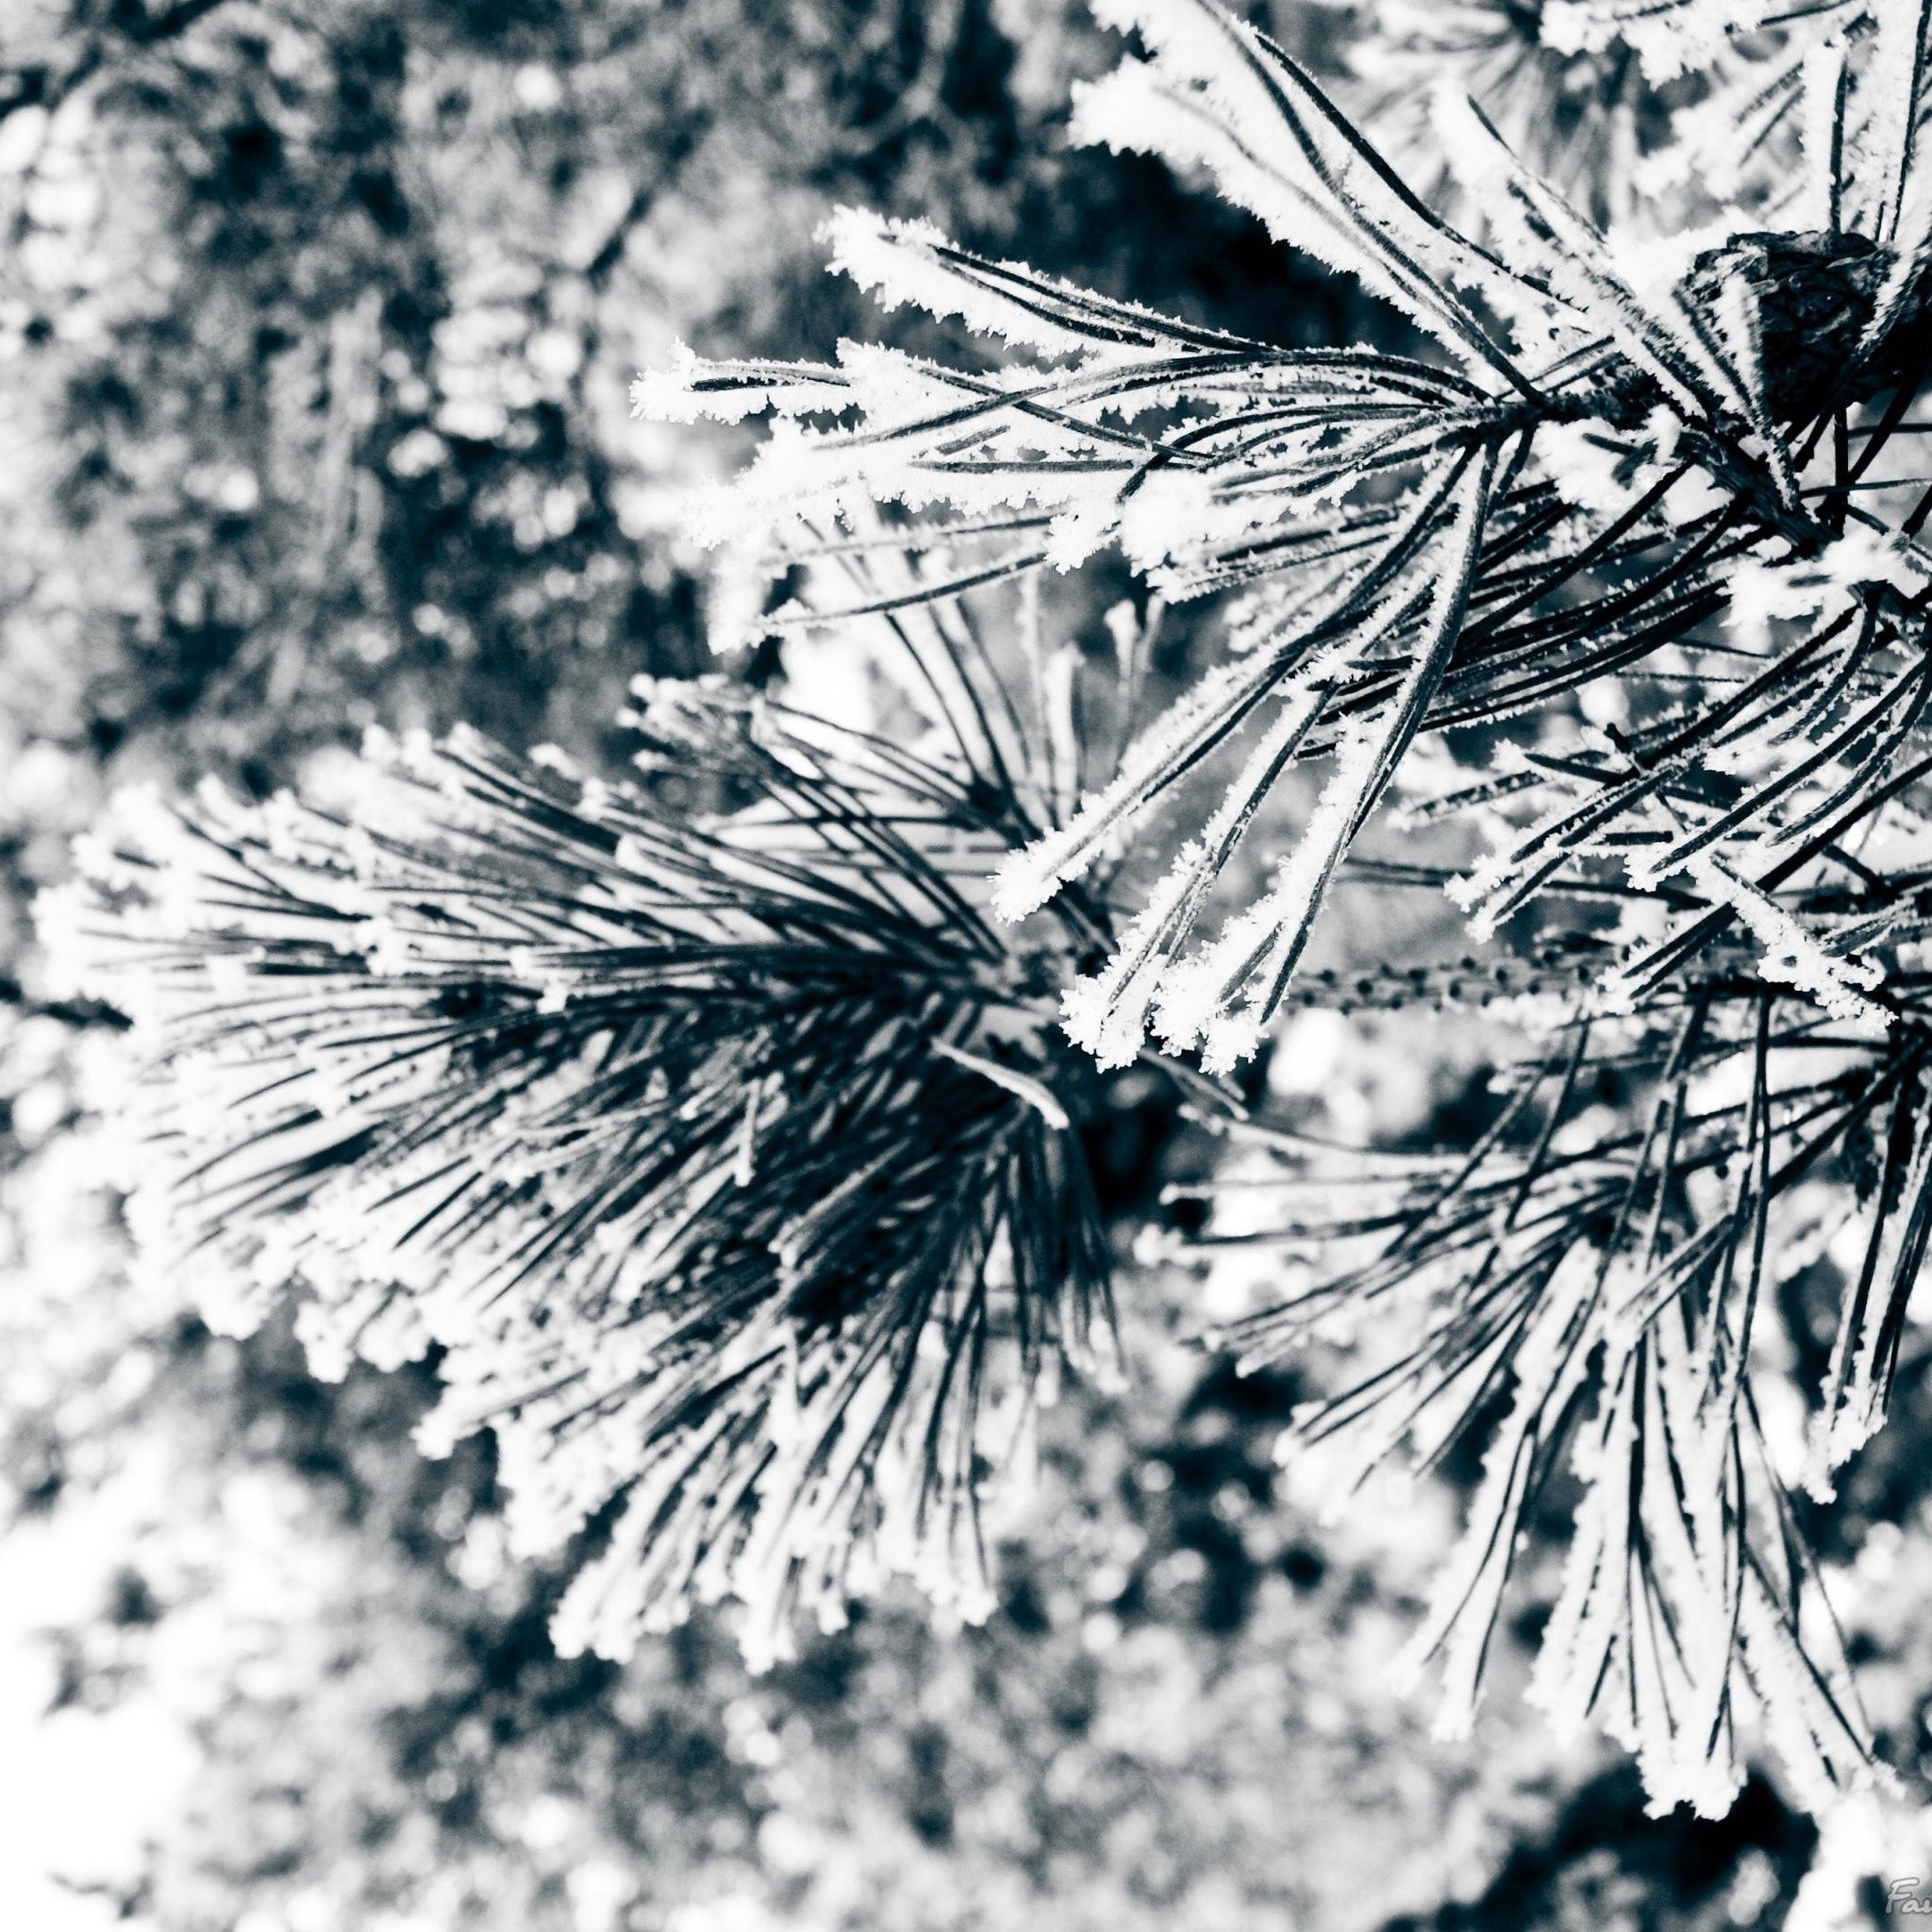 Iphone Wallpaper Snow Trees - HD Wallpaper